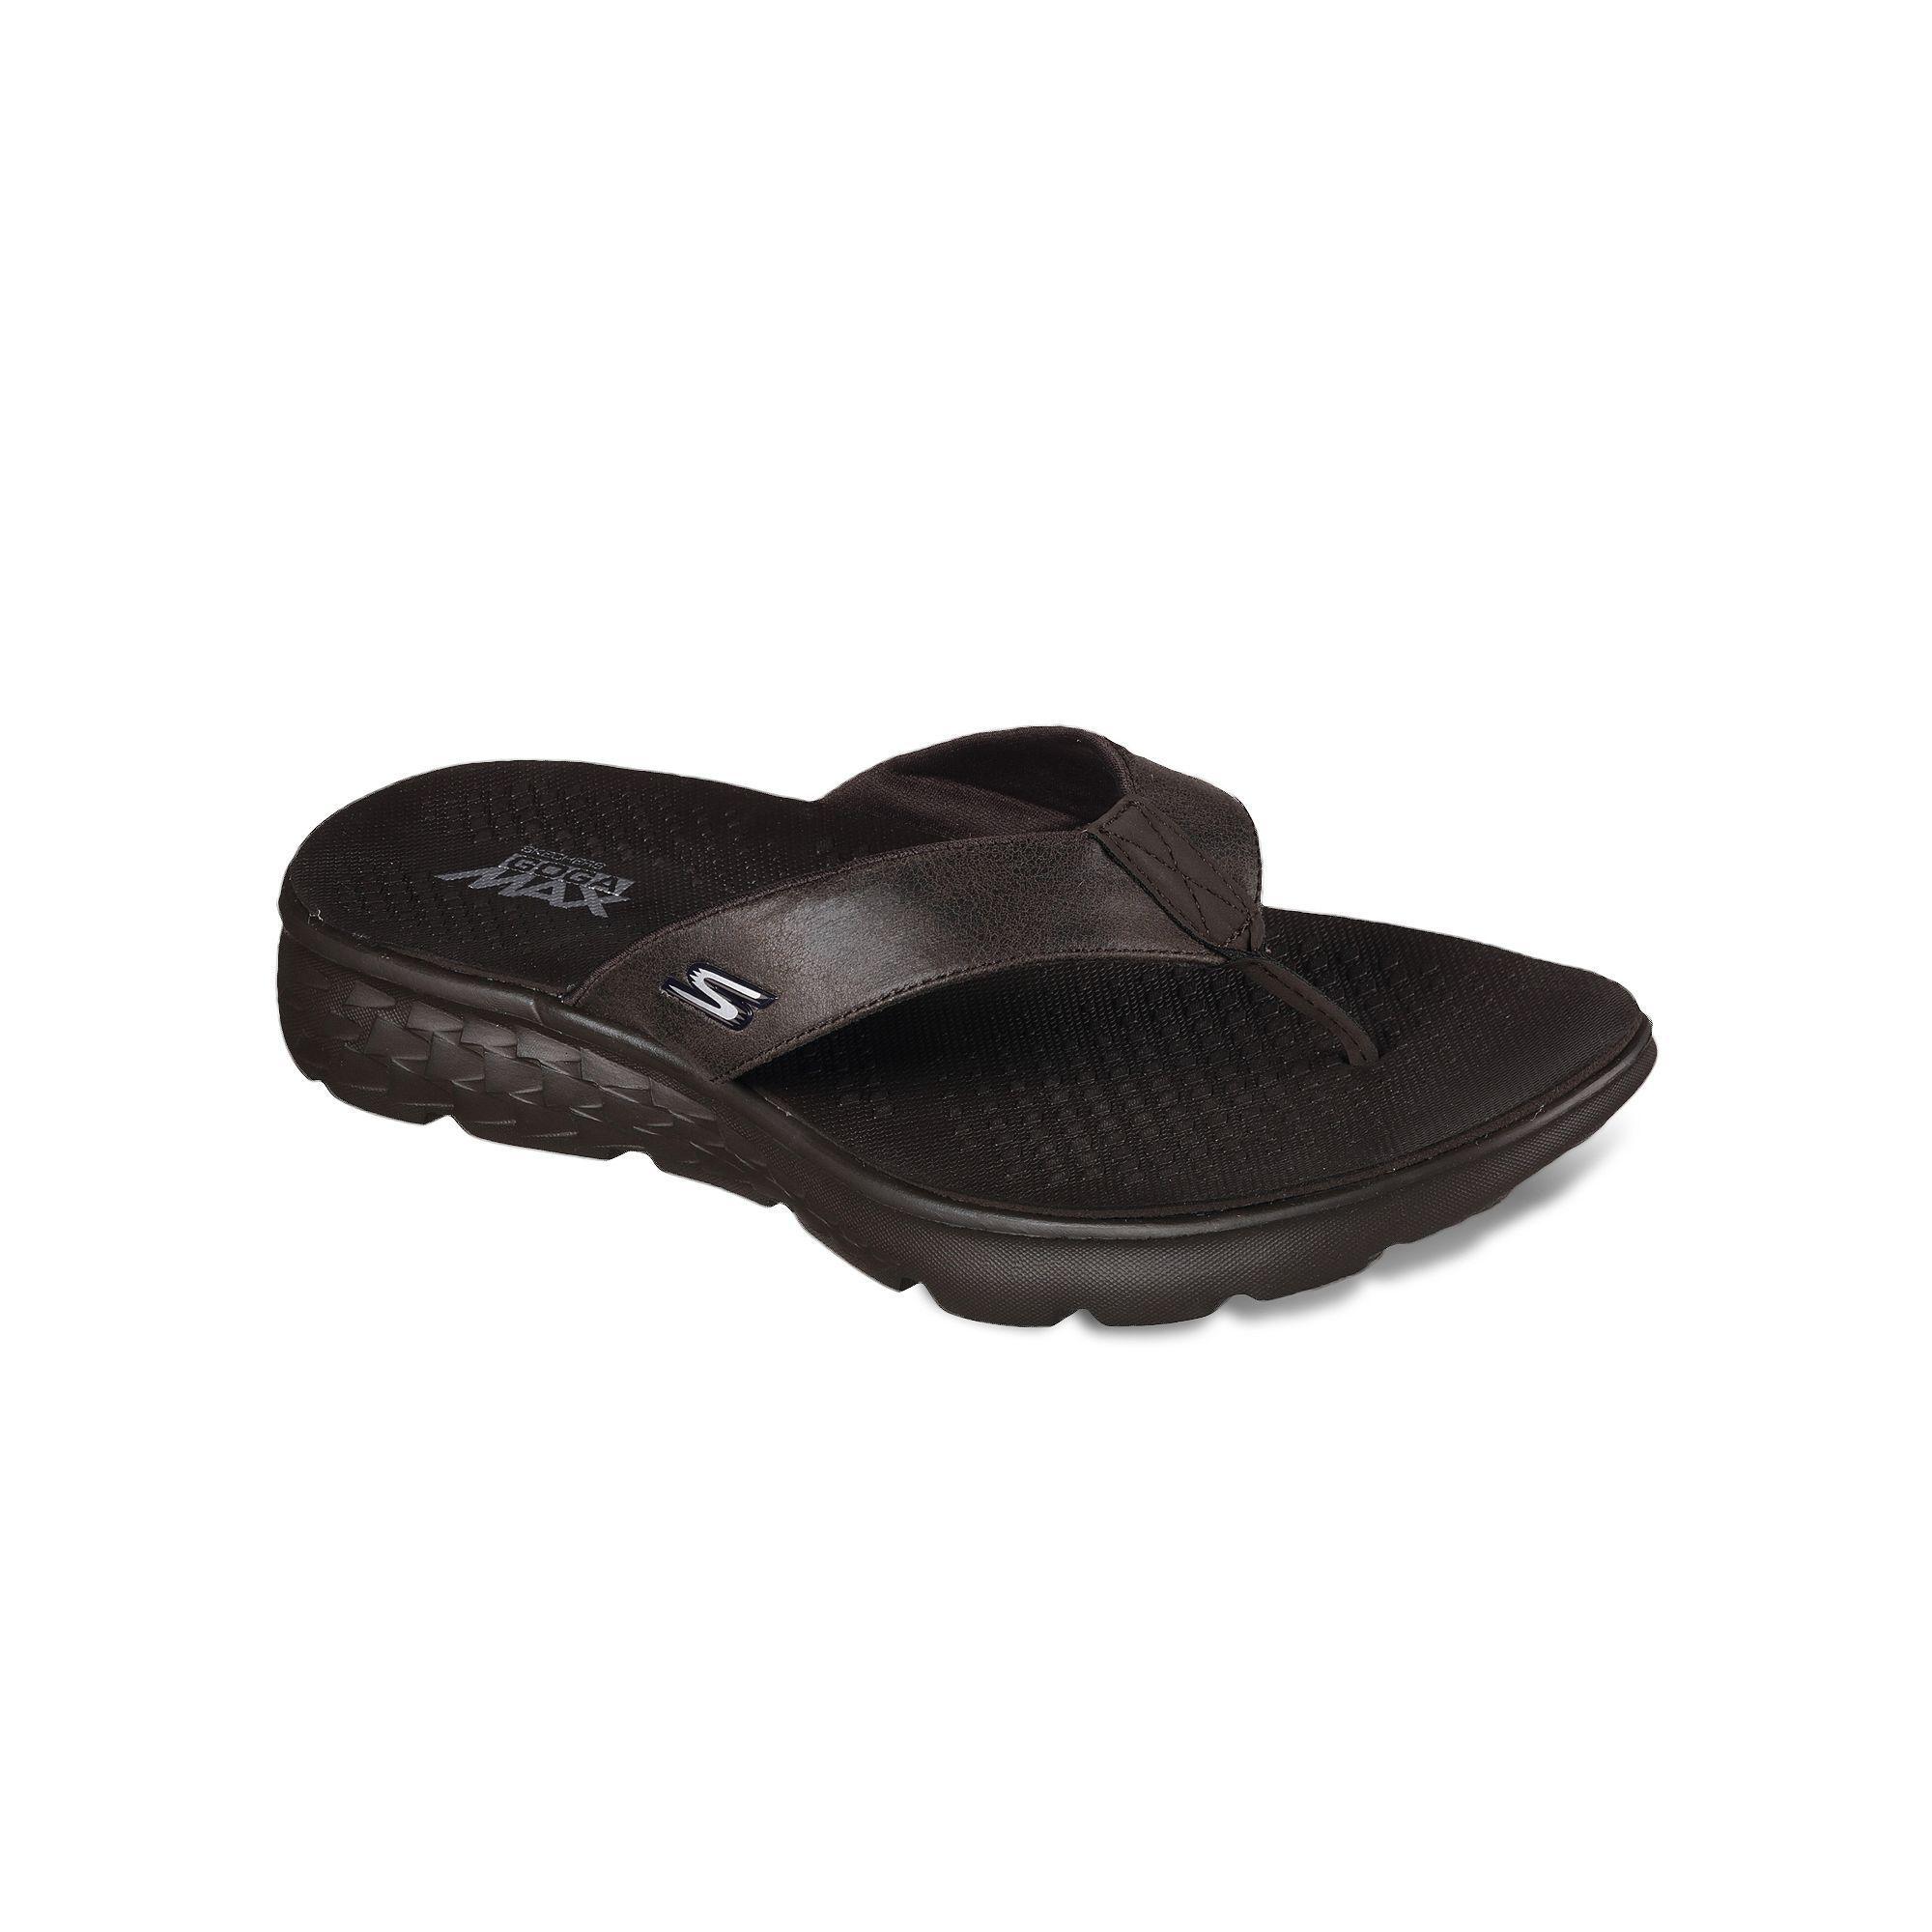 Skechers On the Go 400 Vista Men's Sandals | Skechers on the zPnSV